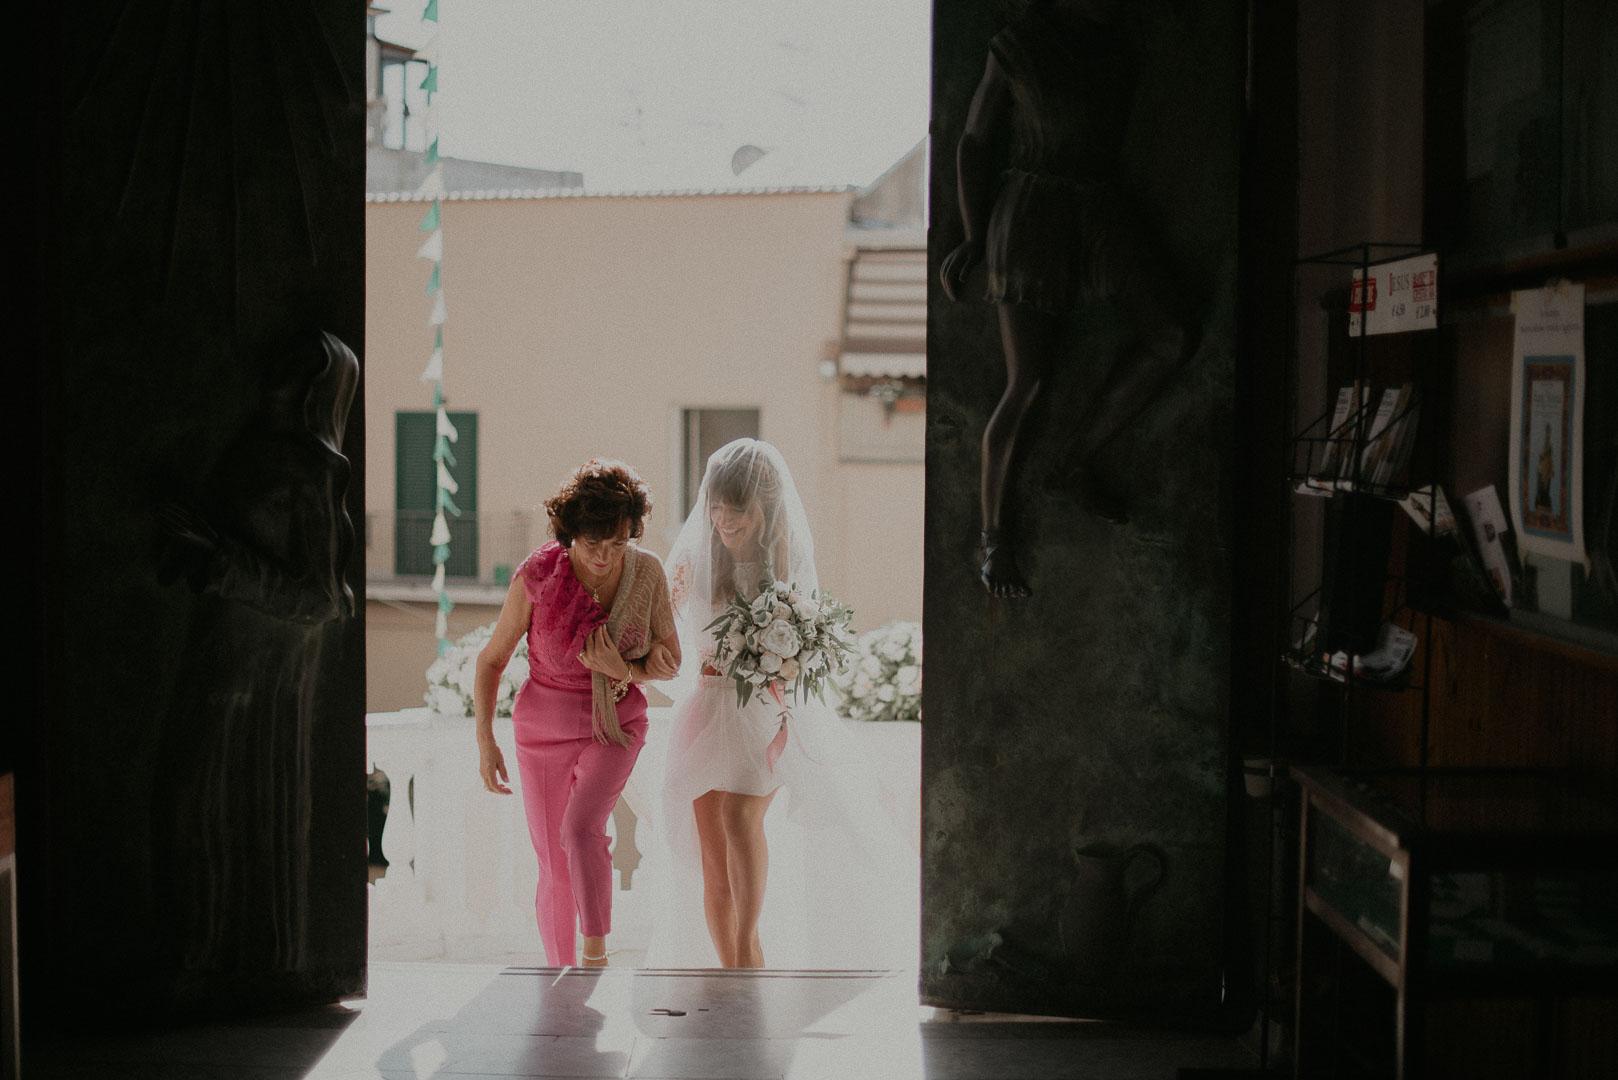 wedding-photographer-destination-fineart-bespoke-reportage-napoli-nabilah-vivianeizzo-spazio46-57